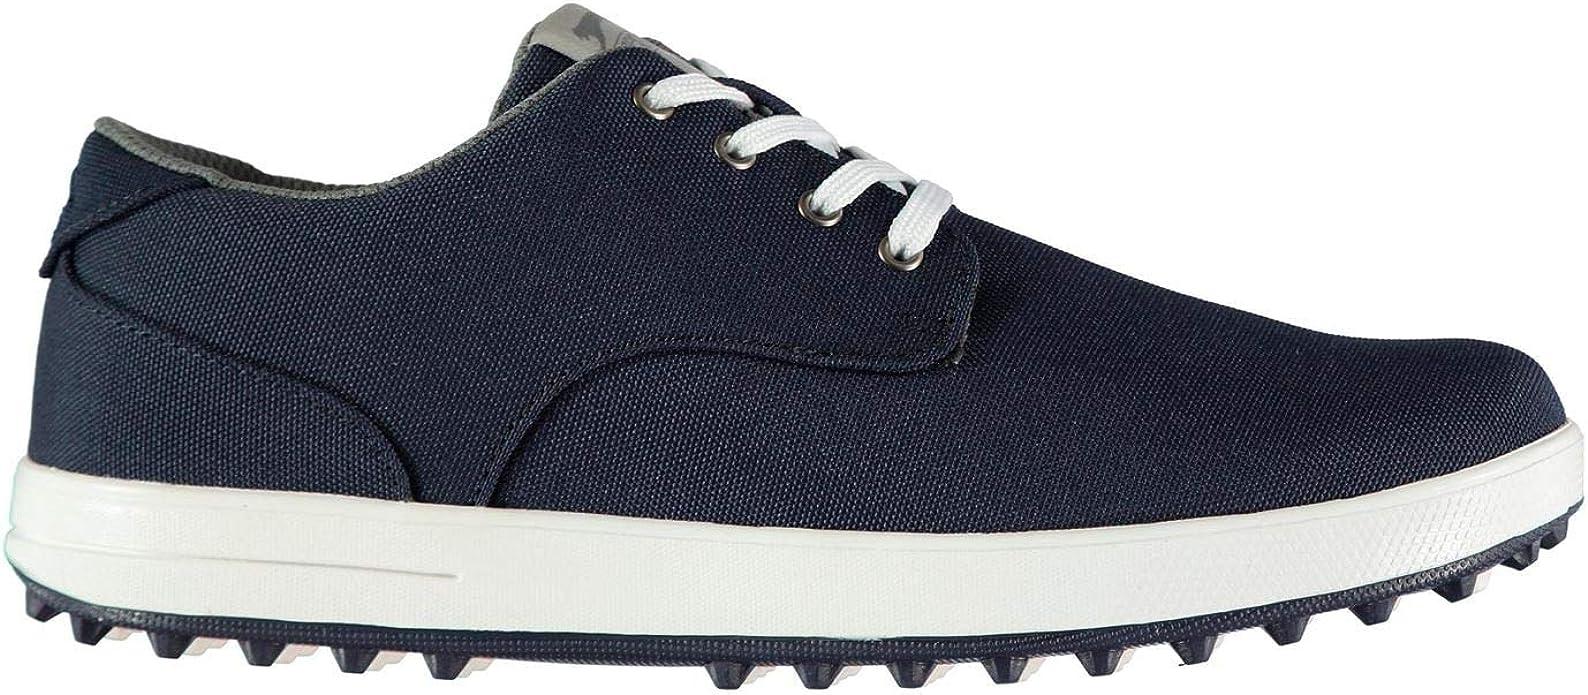 Slazenger Mens Canvas Golf Shoes